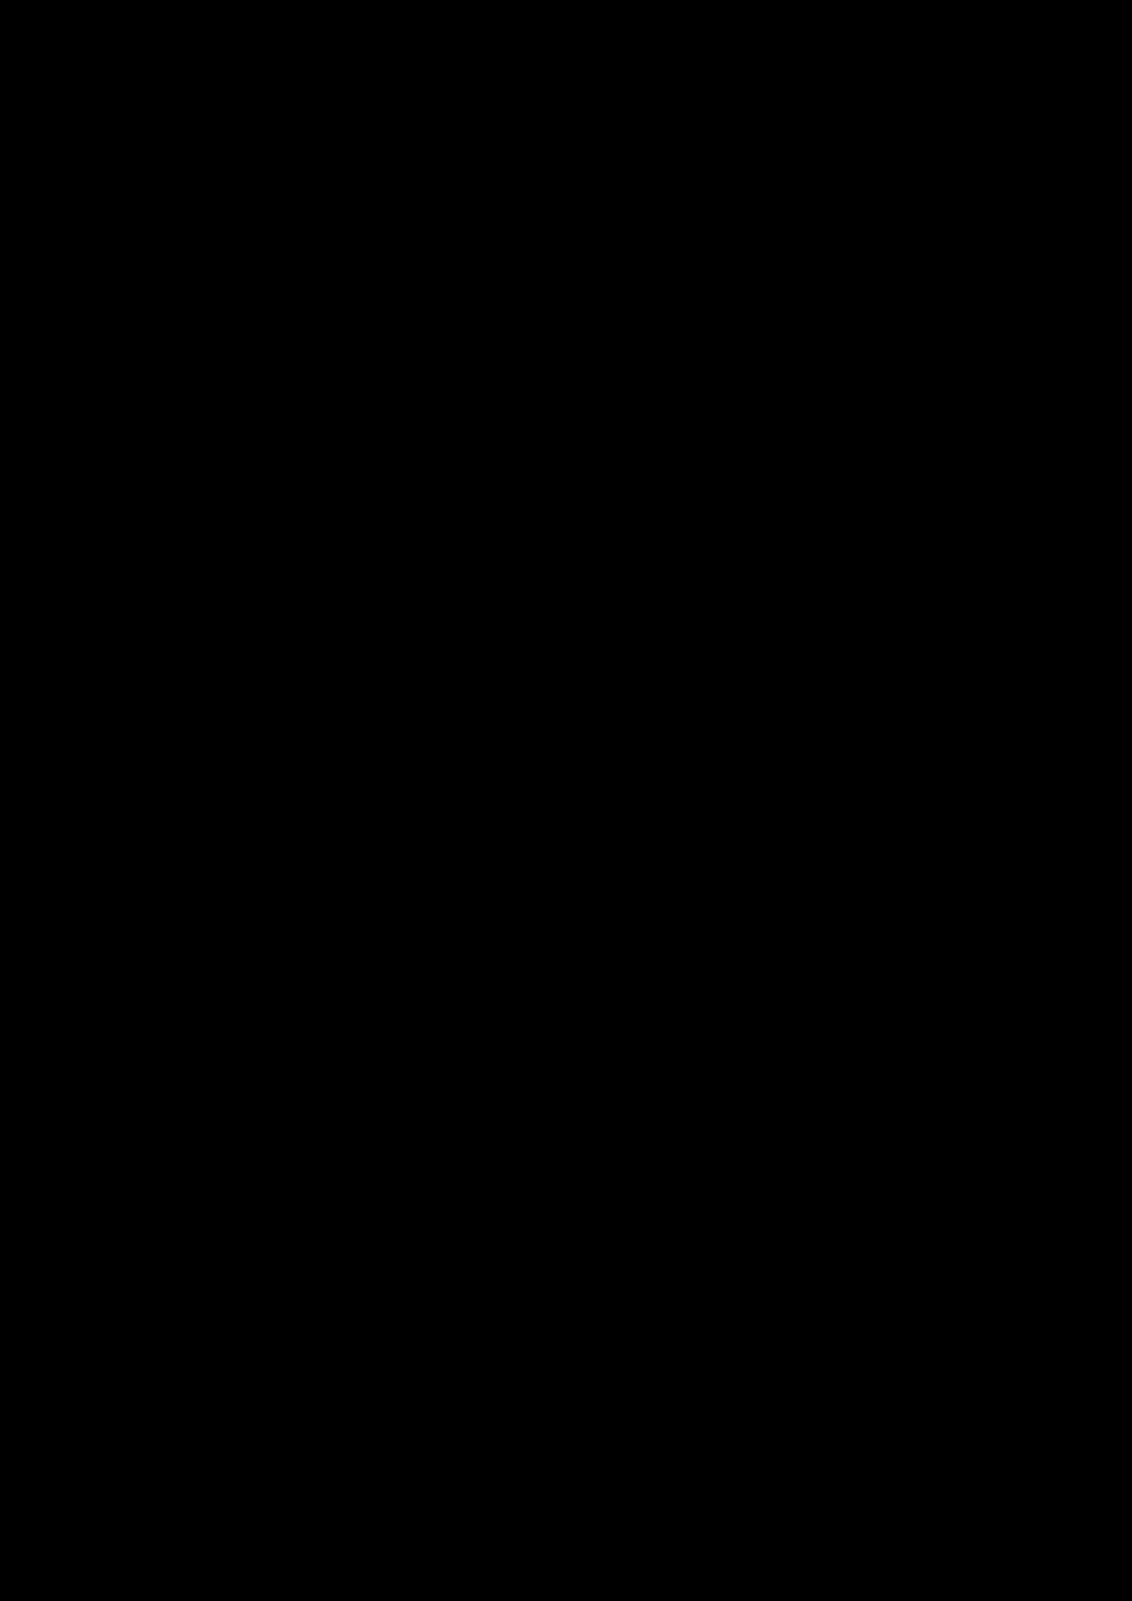 Ispoved Pervogo Boga slide, Image 29